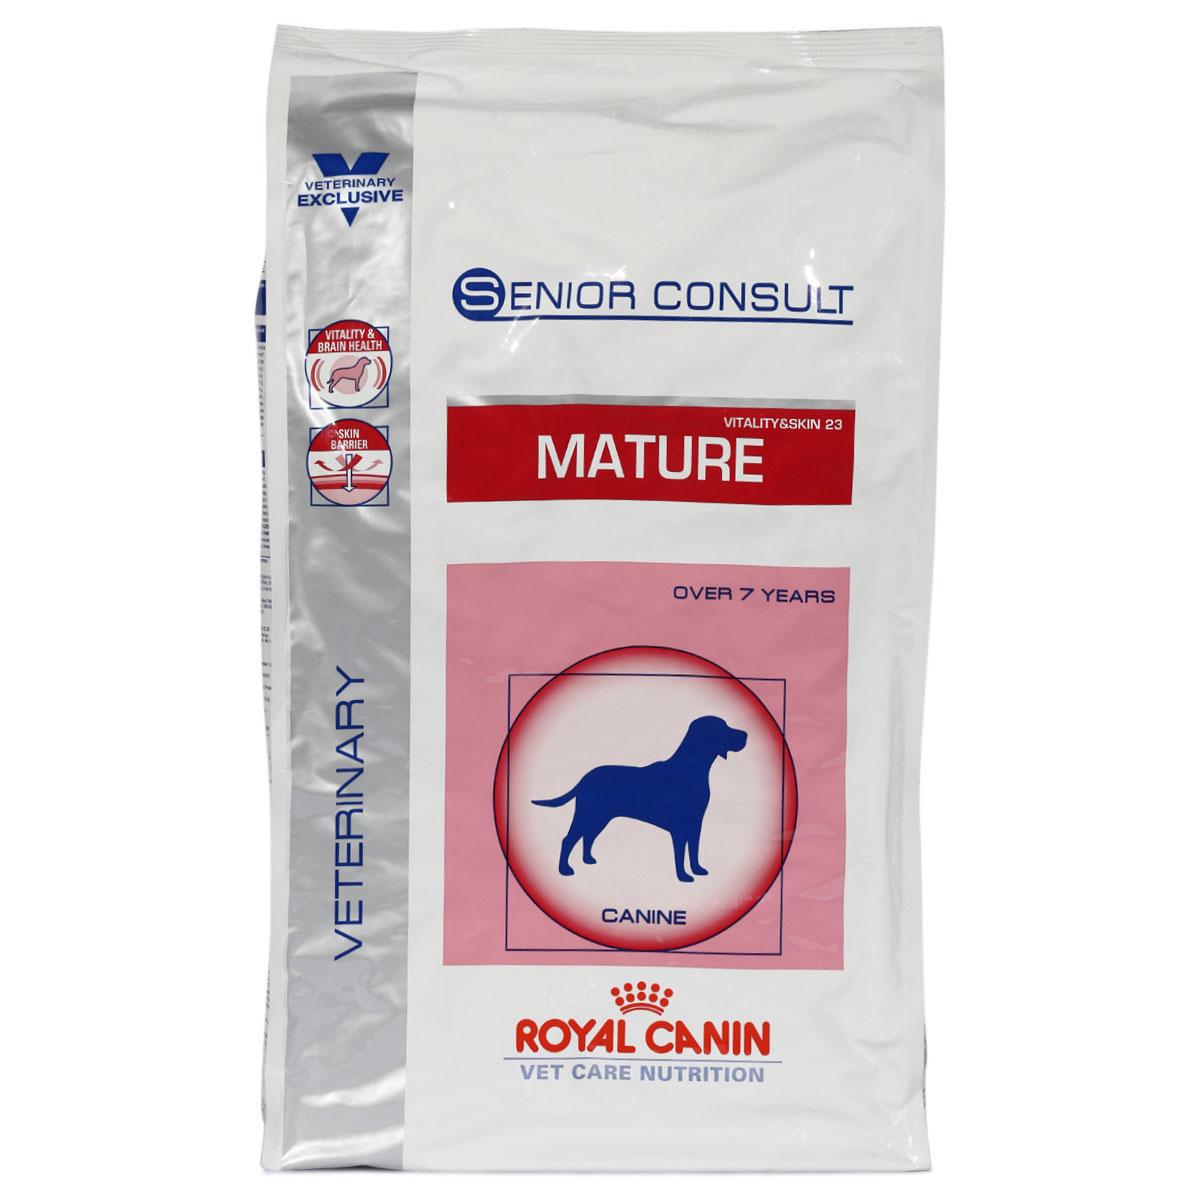 royal canin vet care senior consult mature vitality skin 23. Black Bedroom Furniture Sets. Home Design Ideas